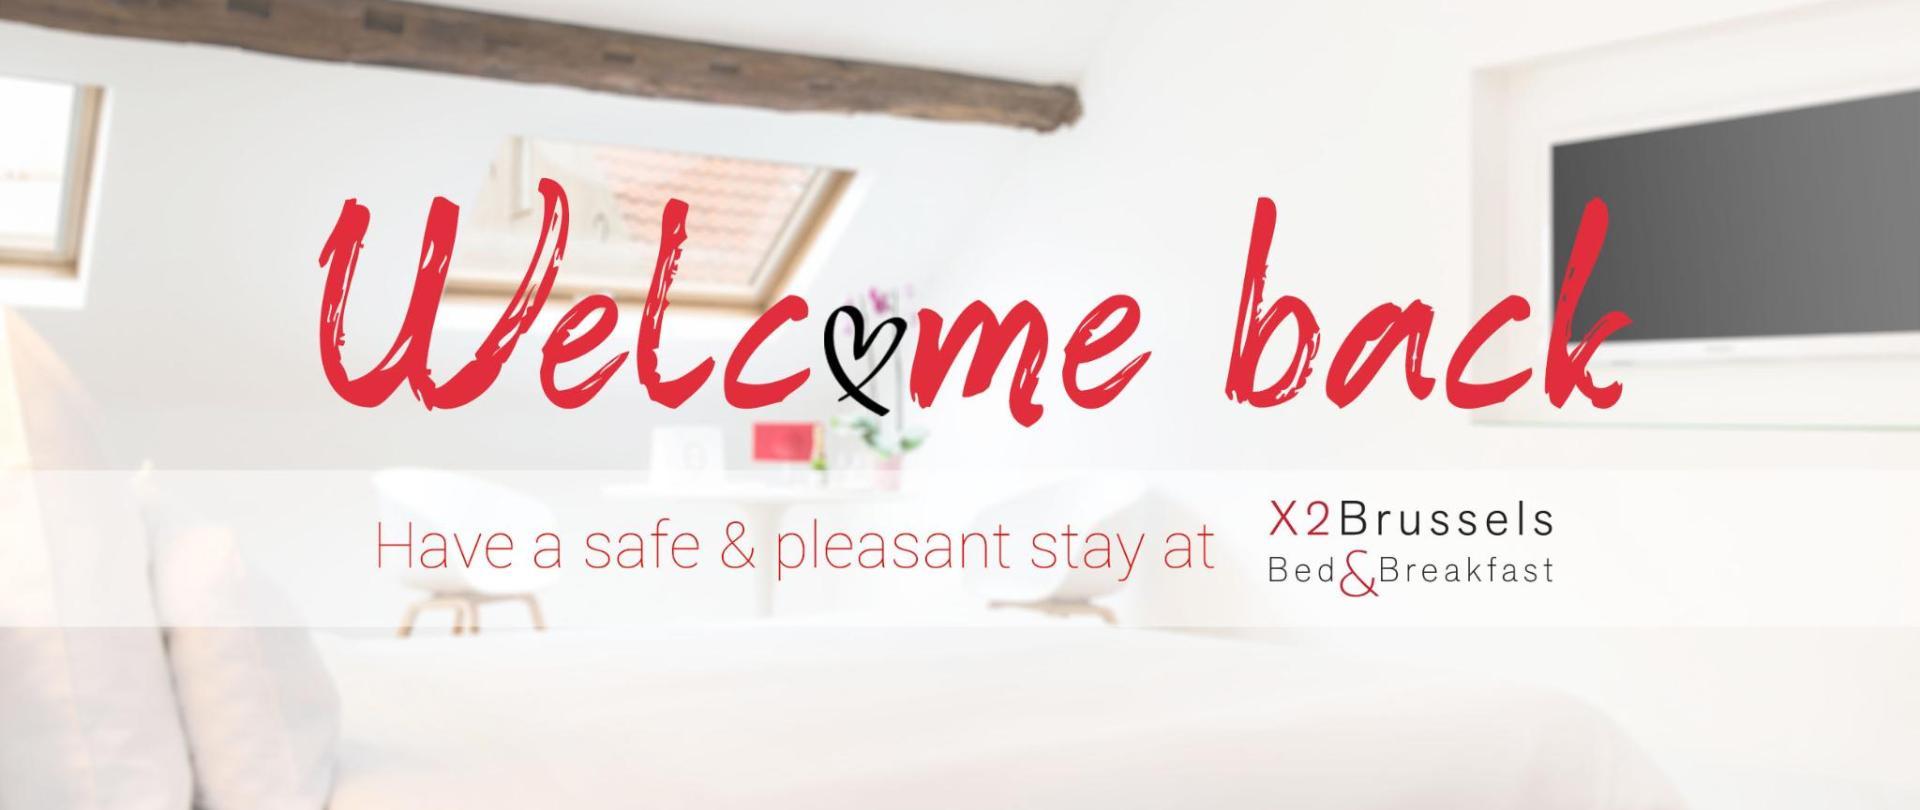 X2B_WEBDIRECT_01.jpg